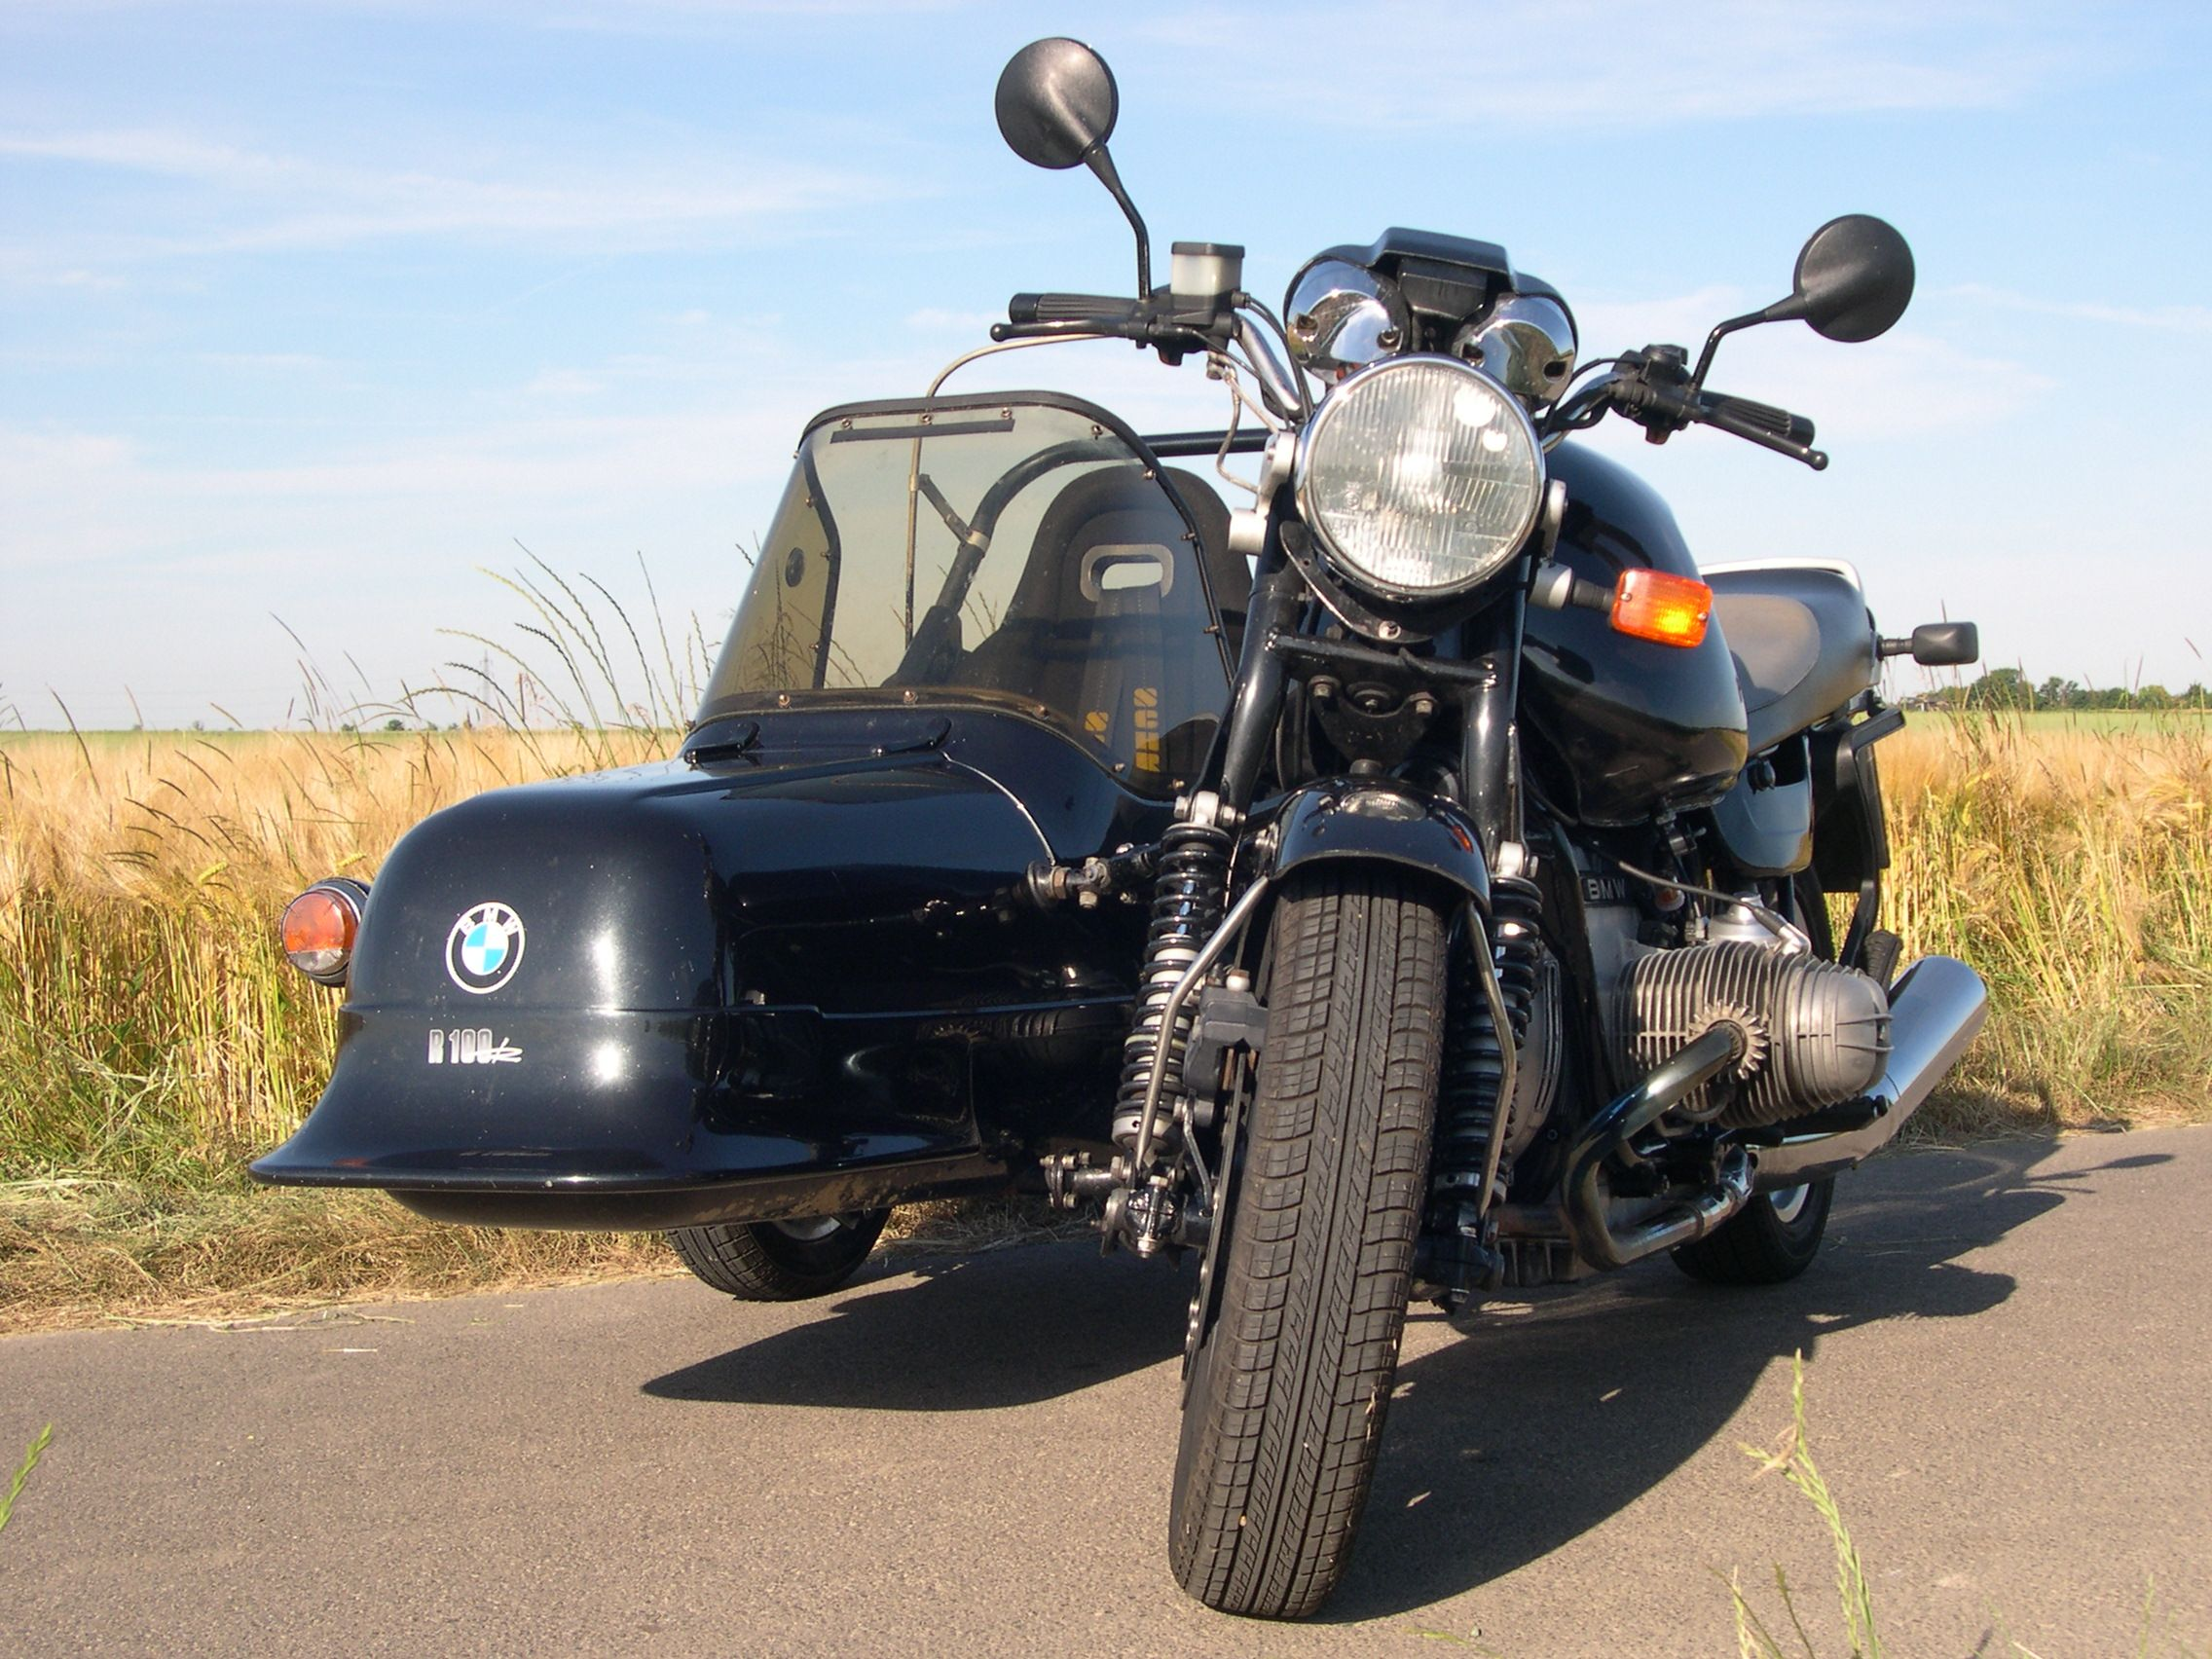 Gaerne Balance Classic Motorradstiefel: : Auto